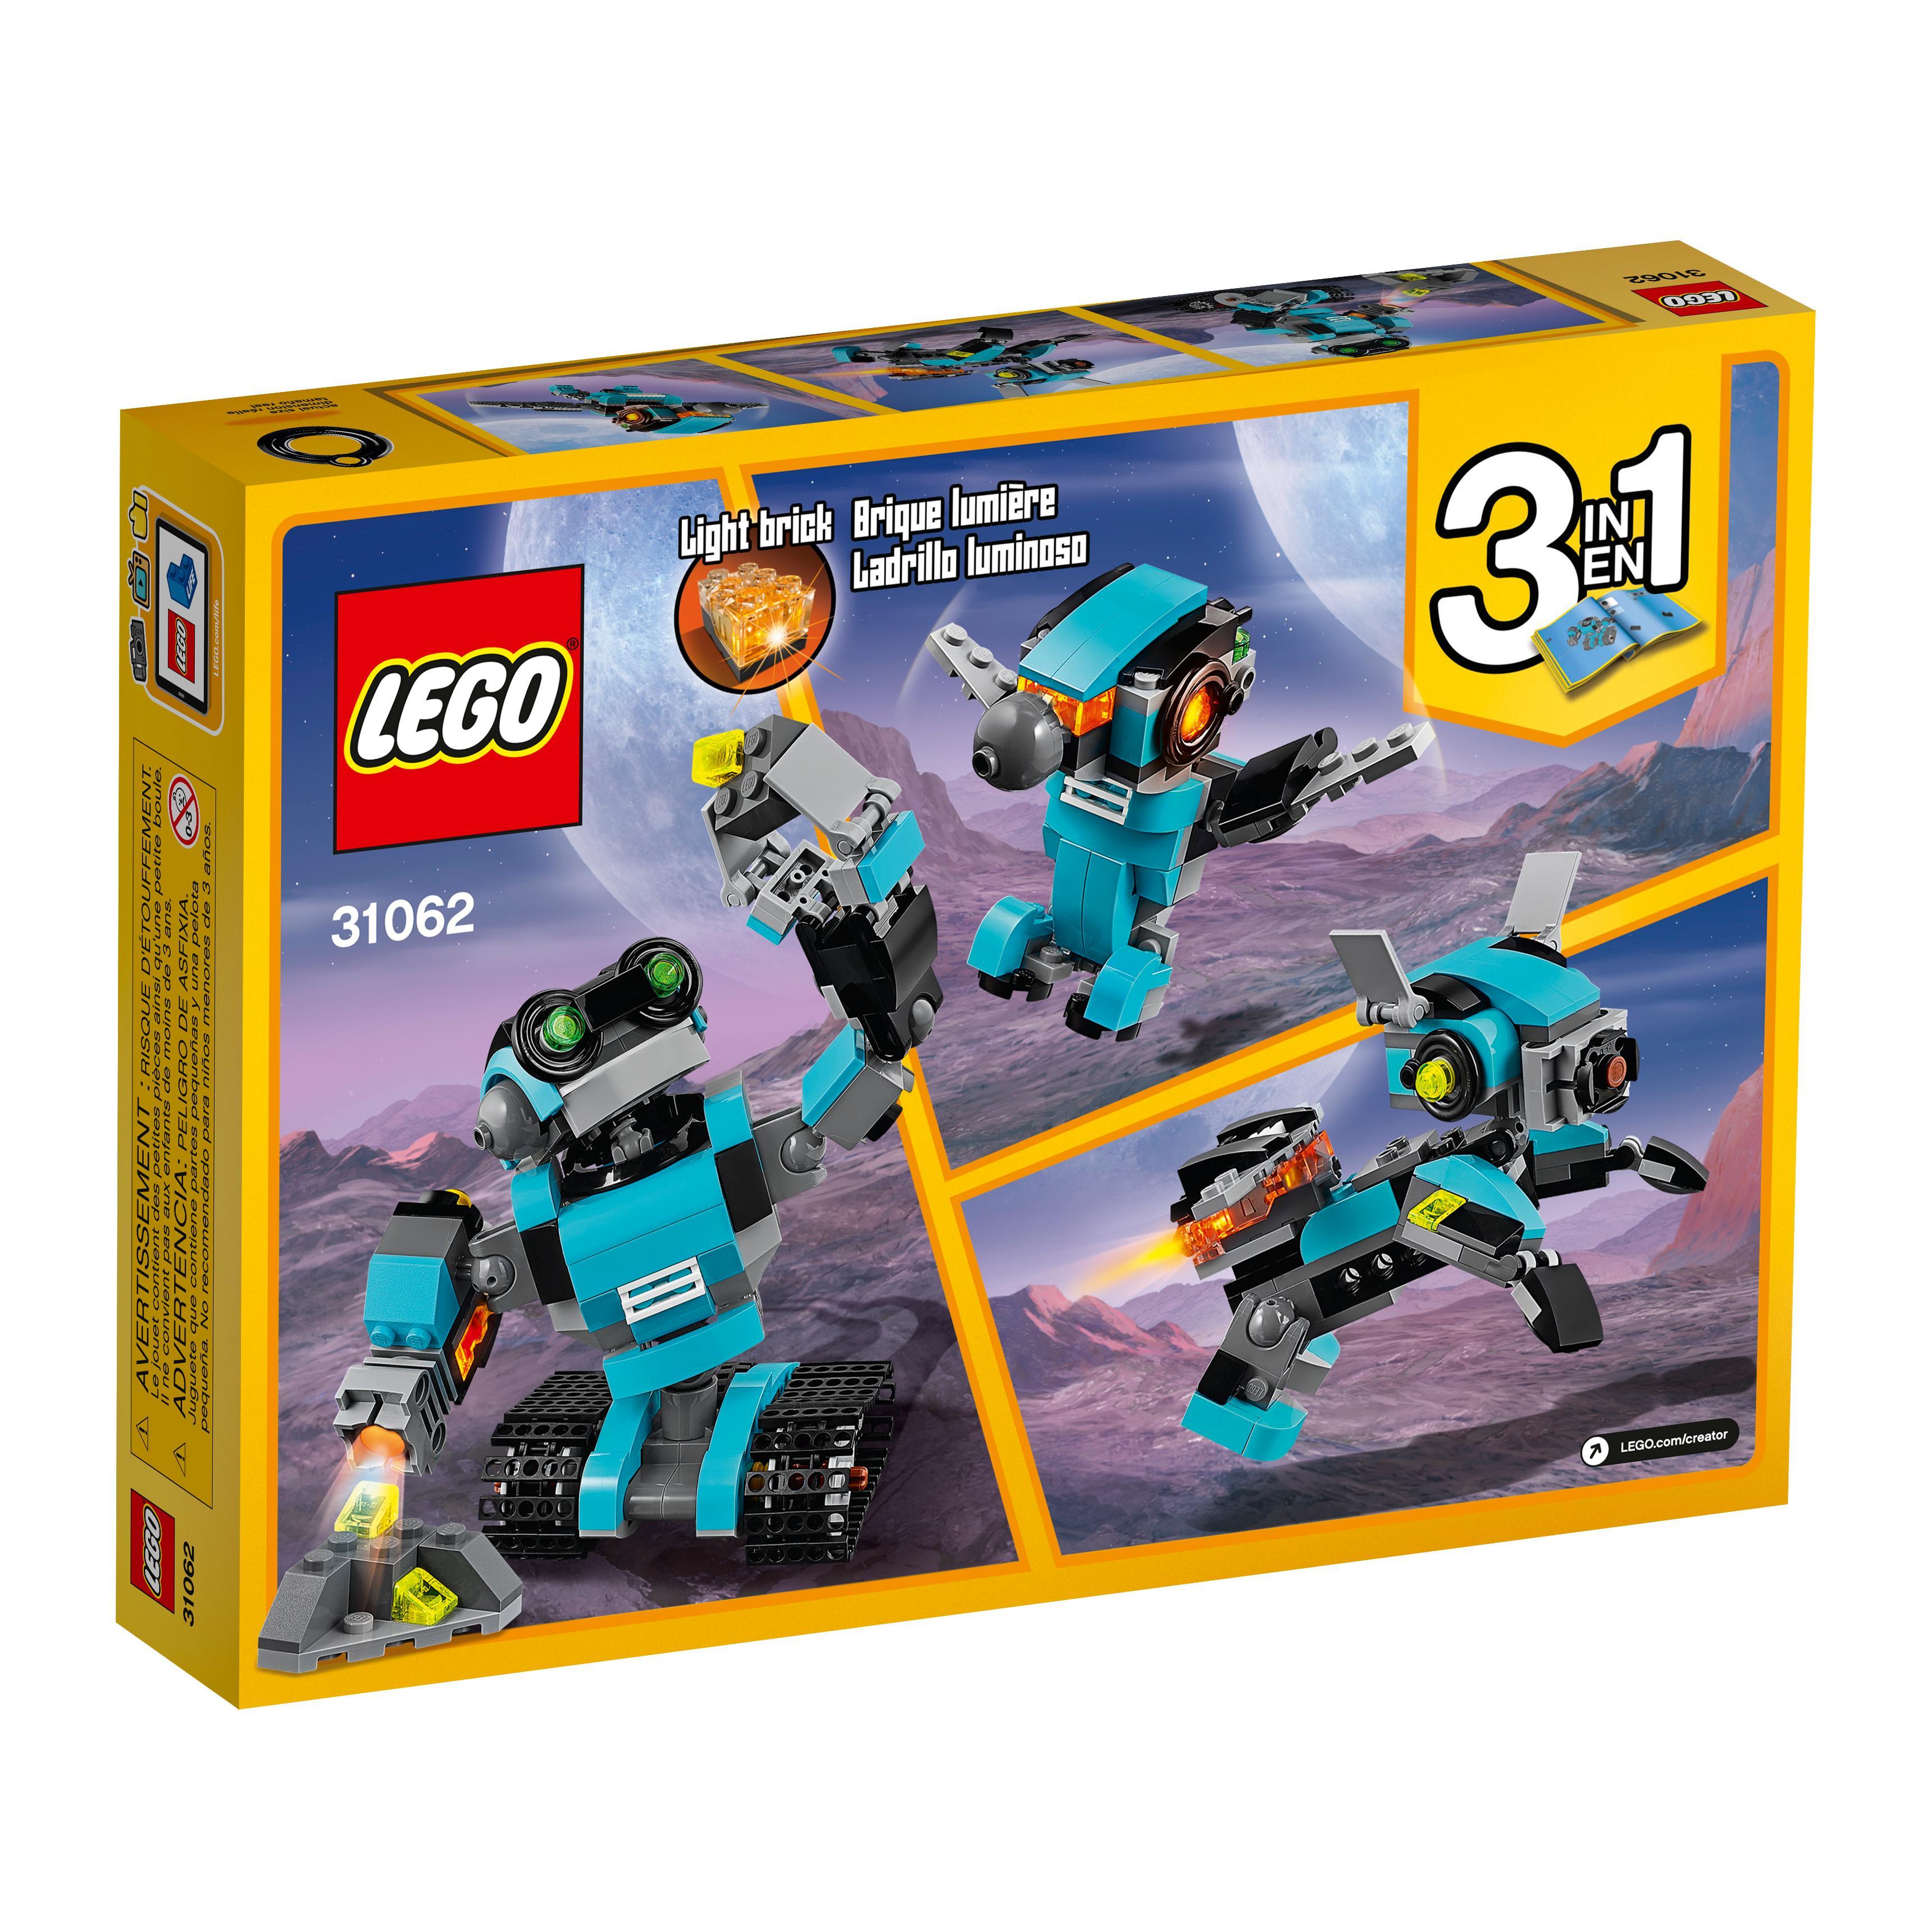 Toys For Legos : Amazon lego creator robo explorer robot toy